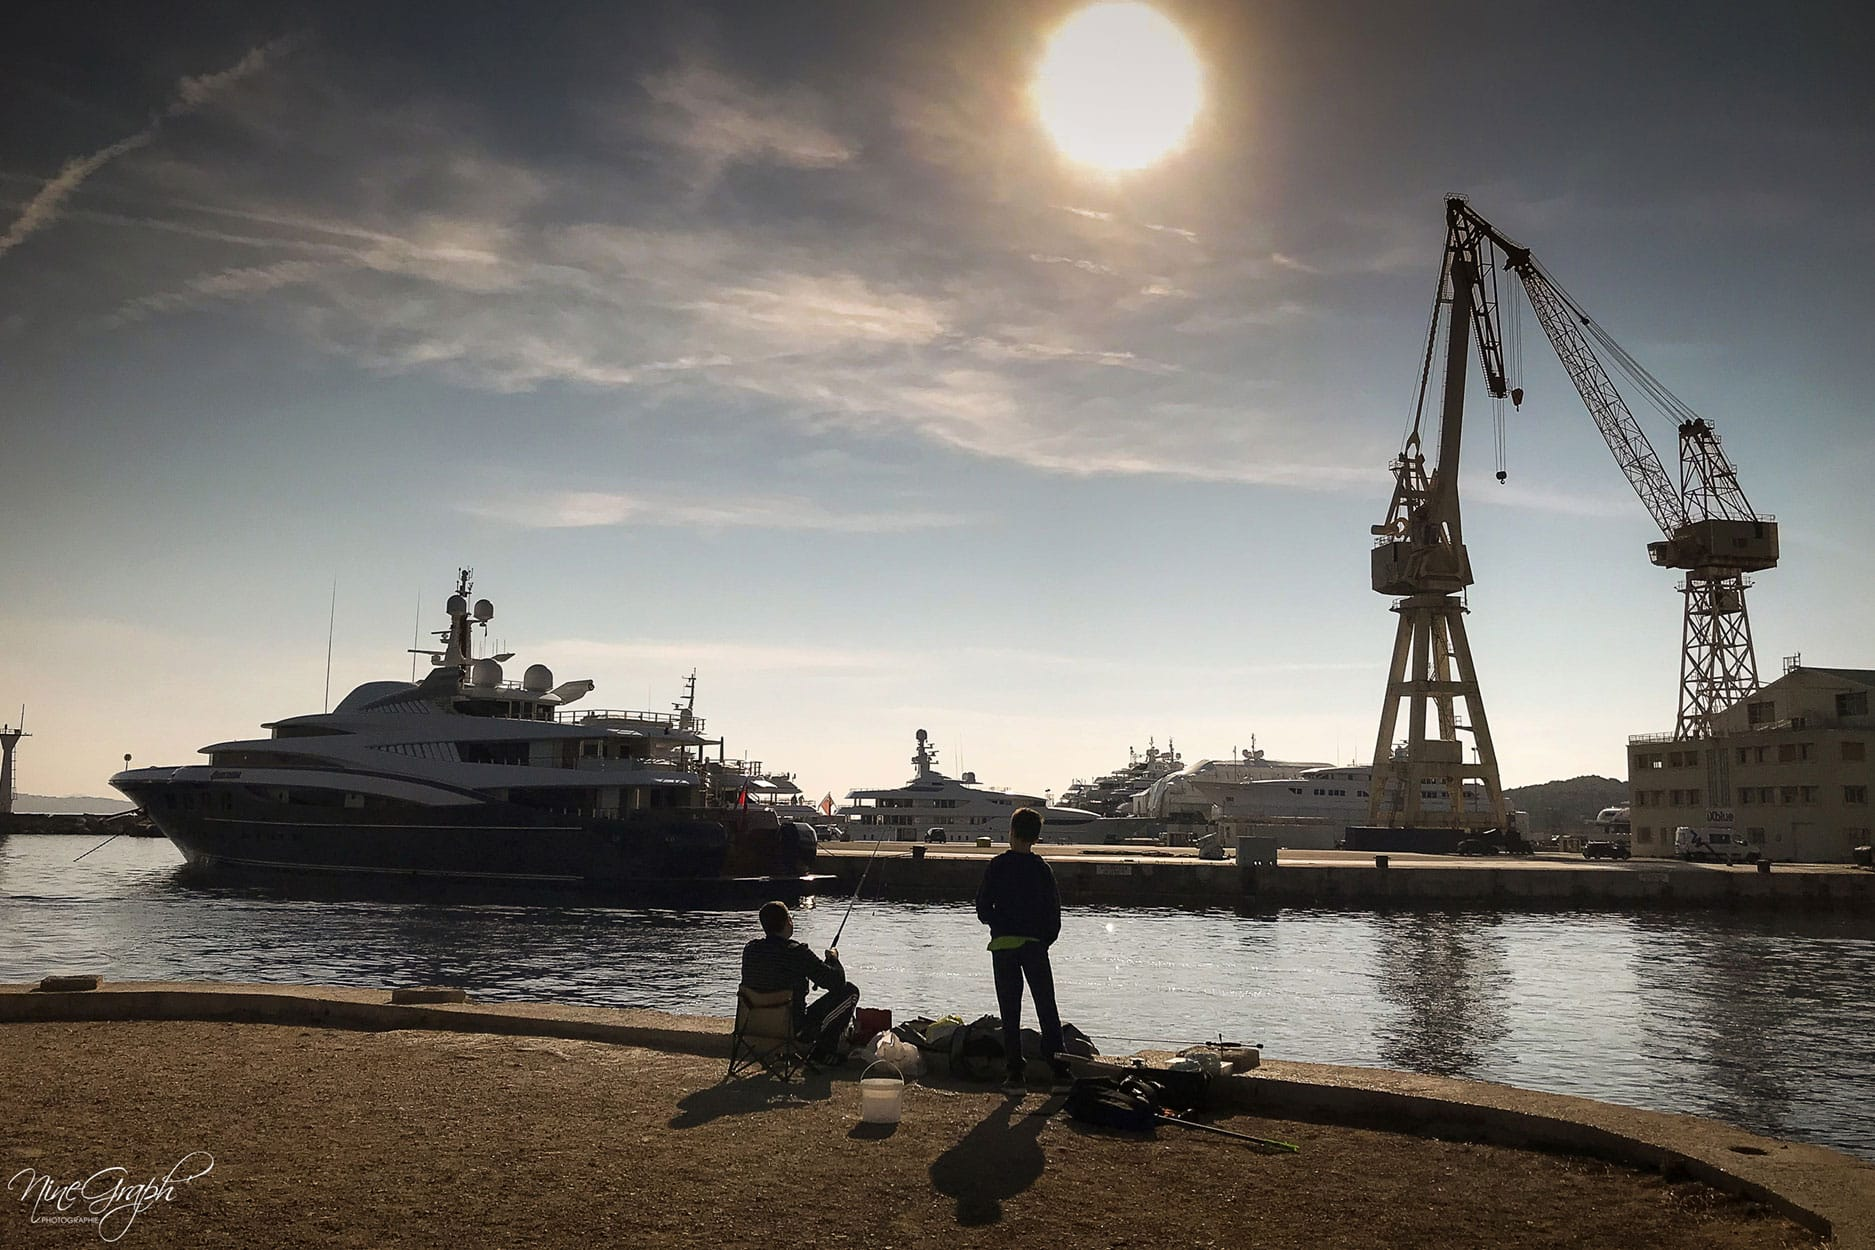 Pêcheurs au port de La Ciotat